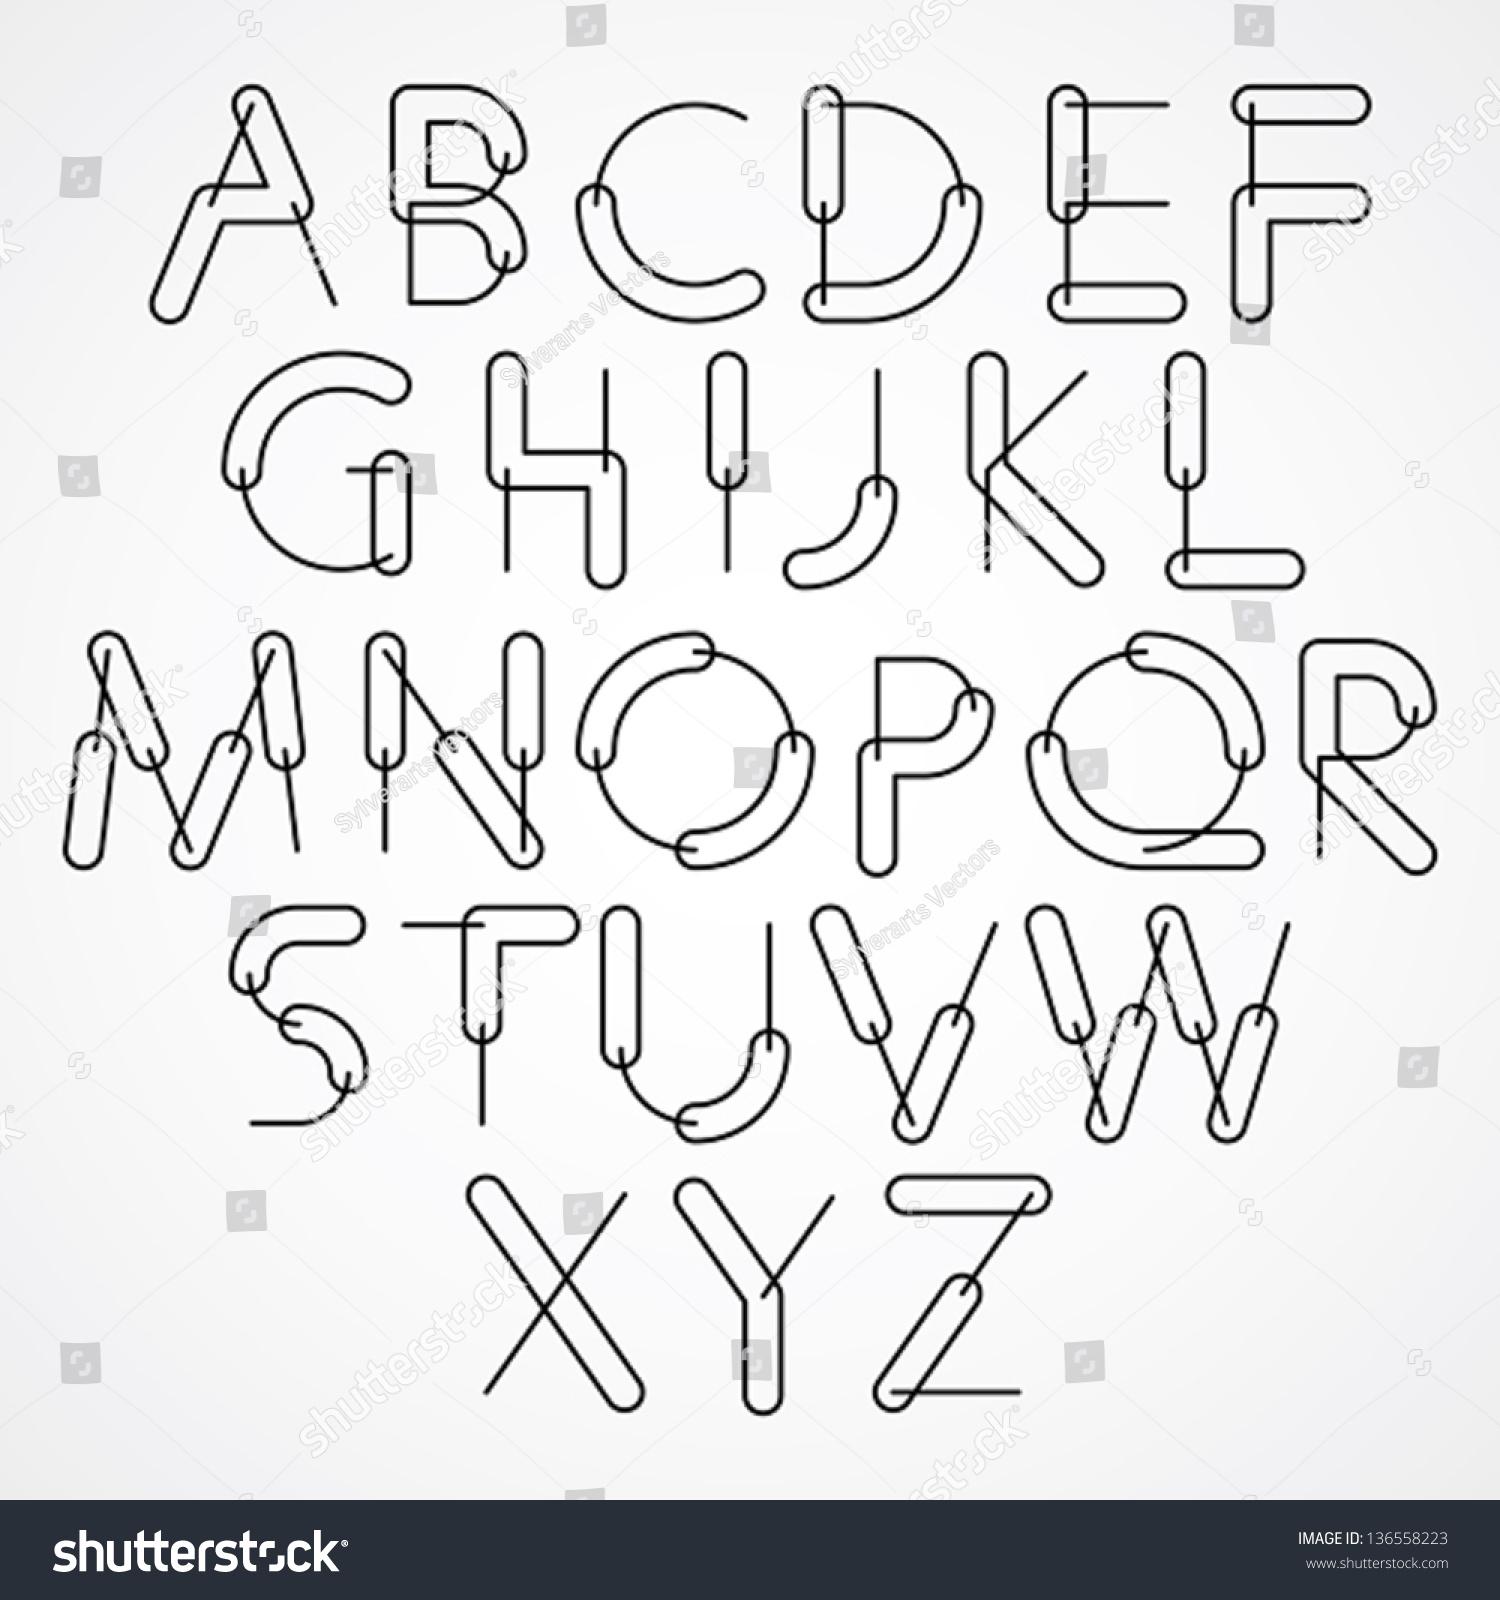 Weird Font Vector Alphabet Letters Black Stock Vector ...